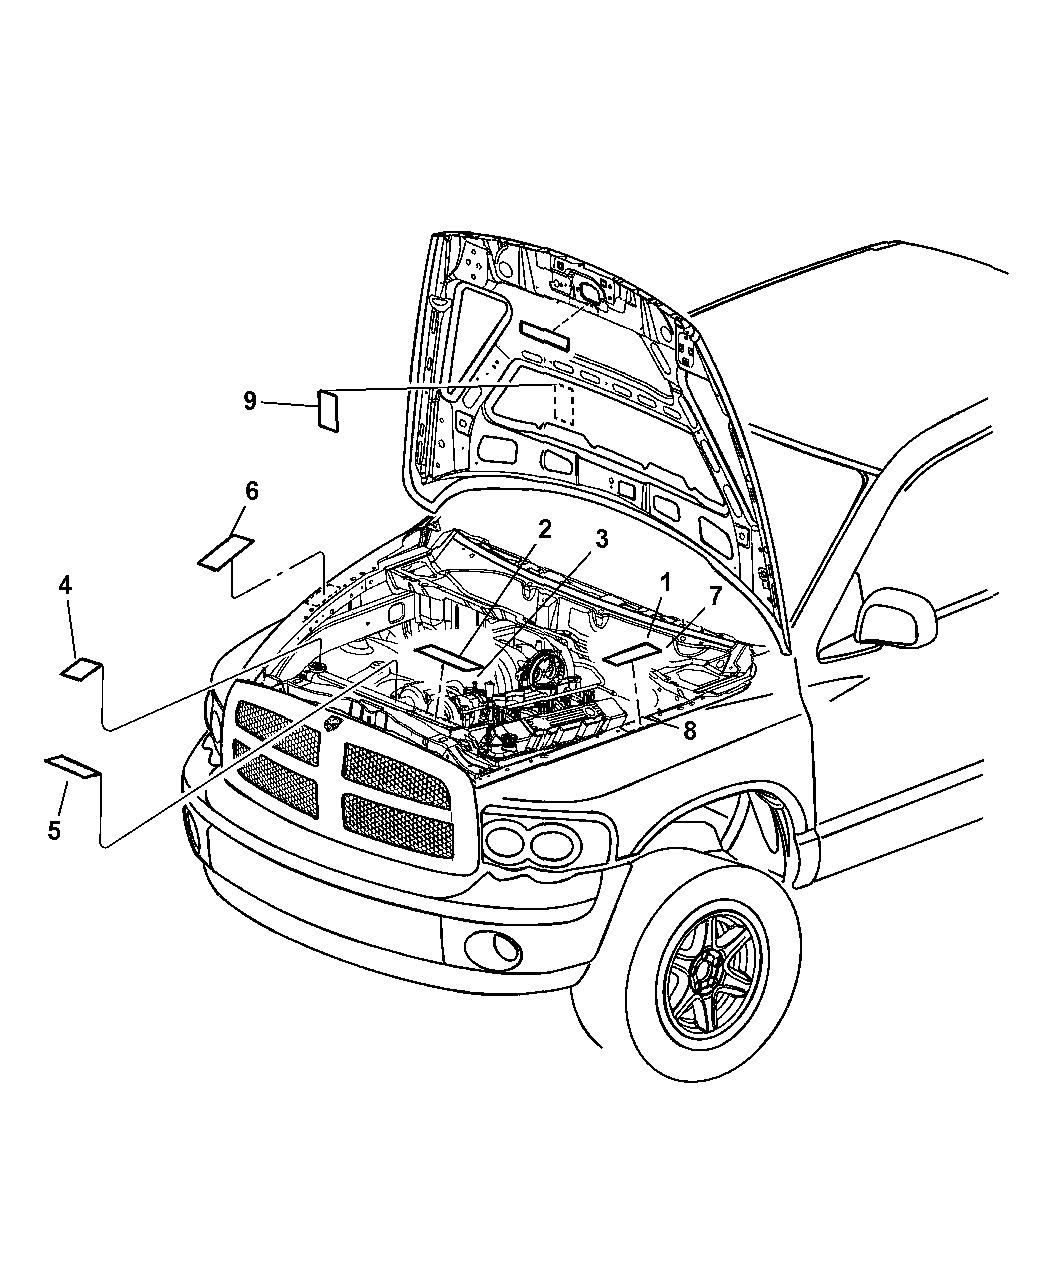 68000734aa